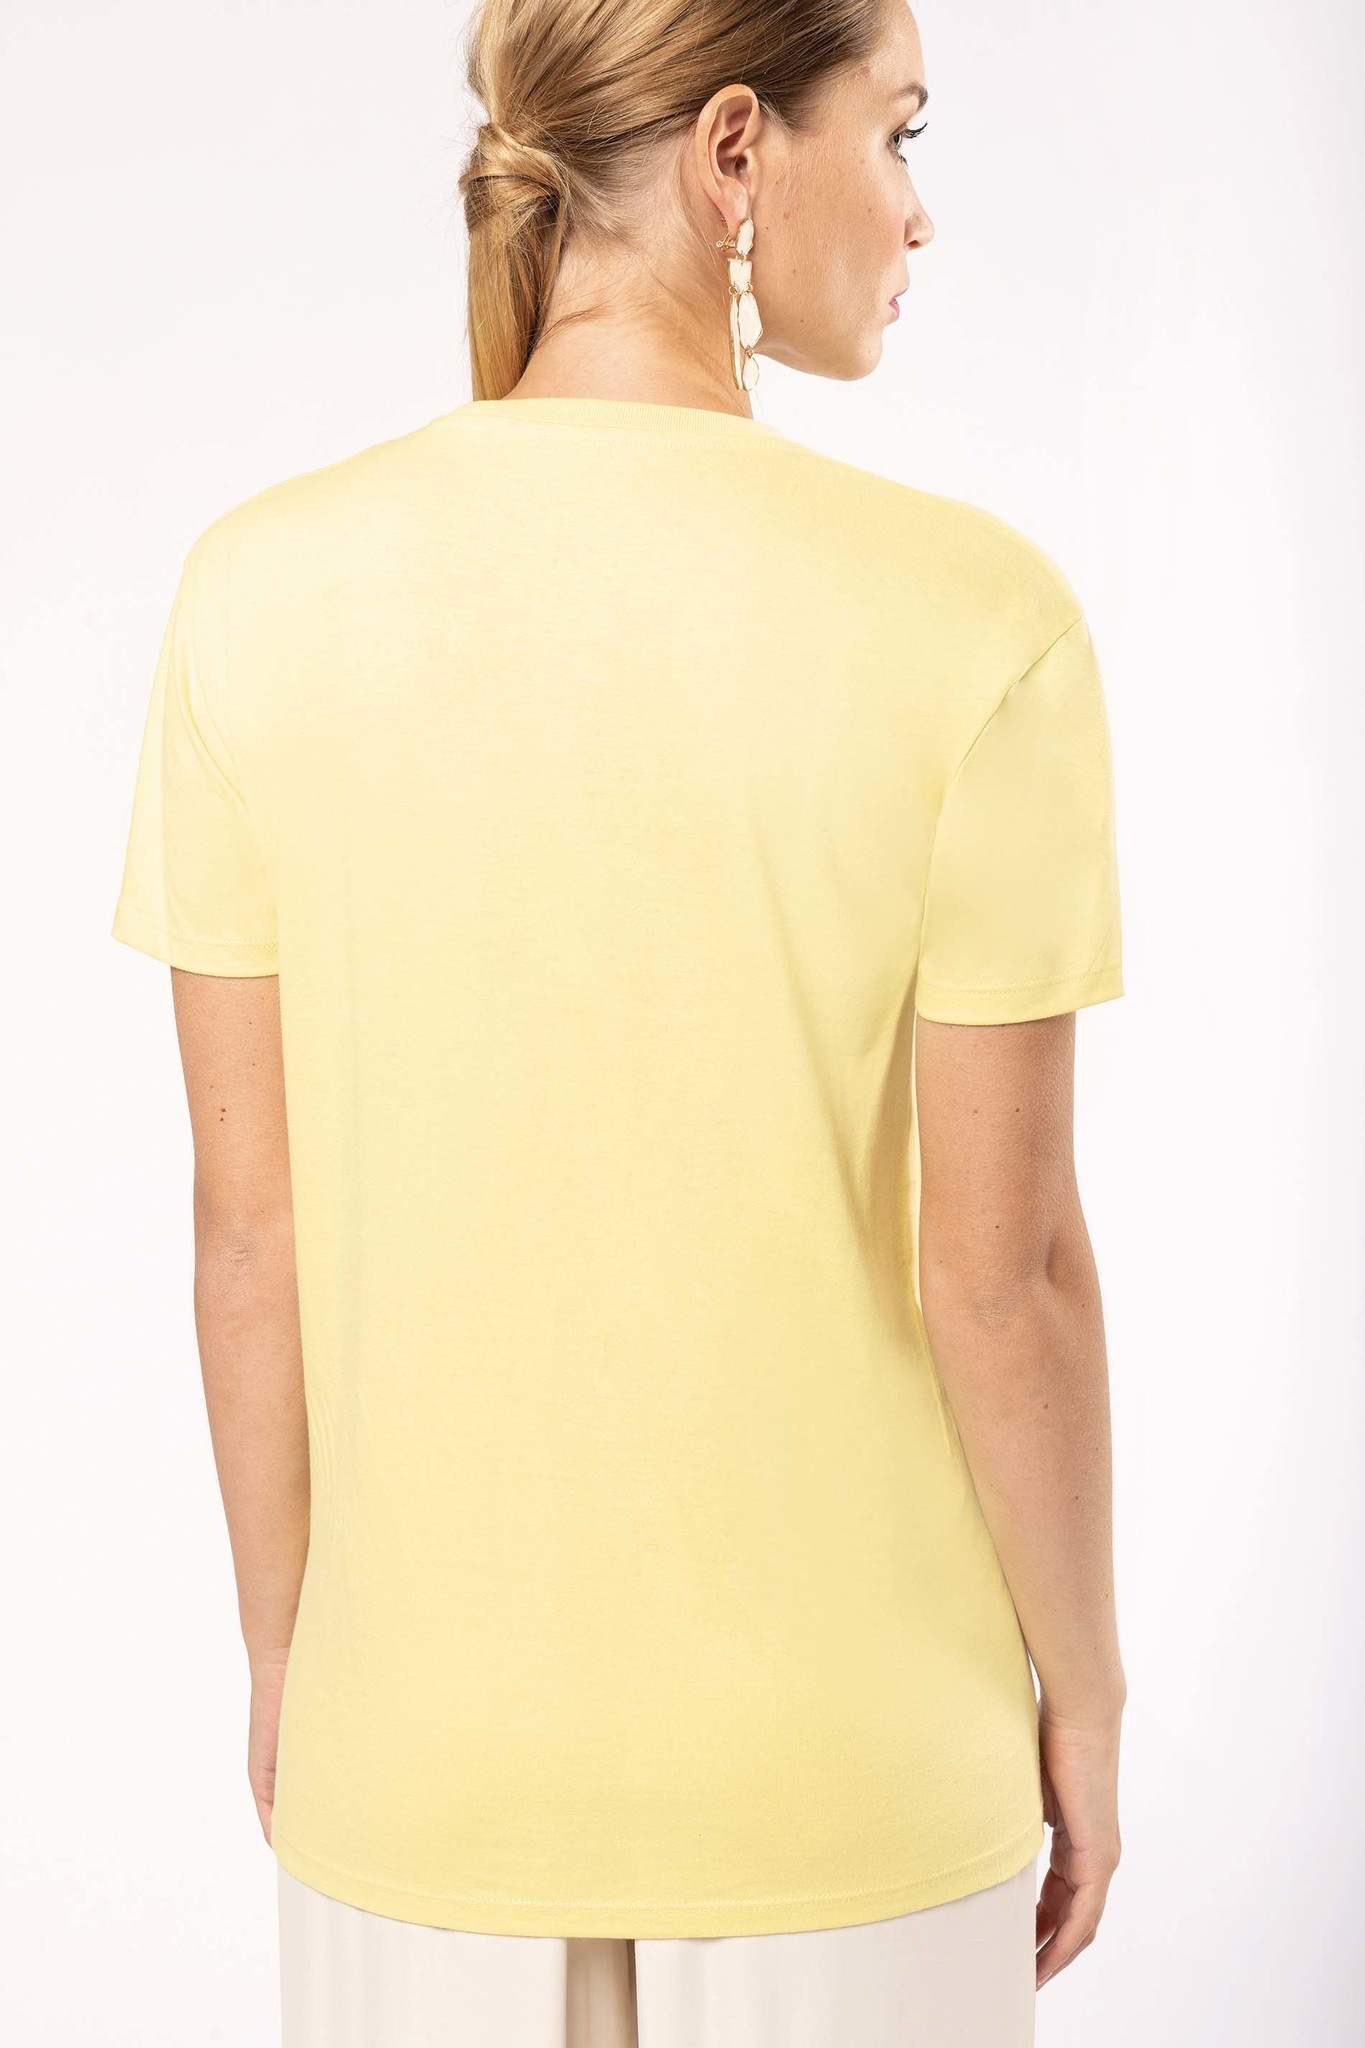 Eco-Friendly Unisex T-shirt - Sage